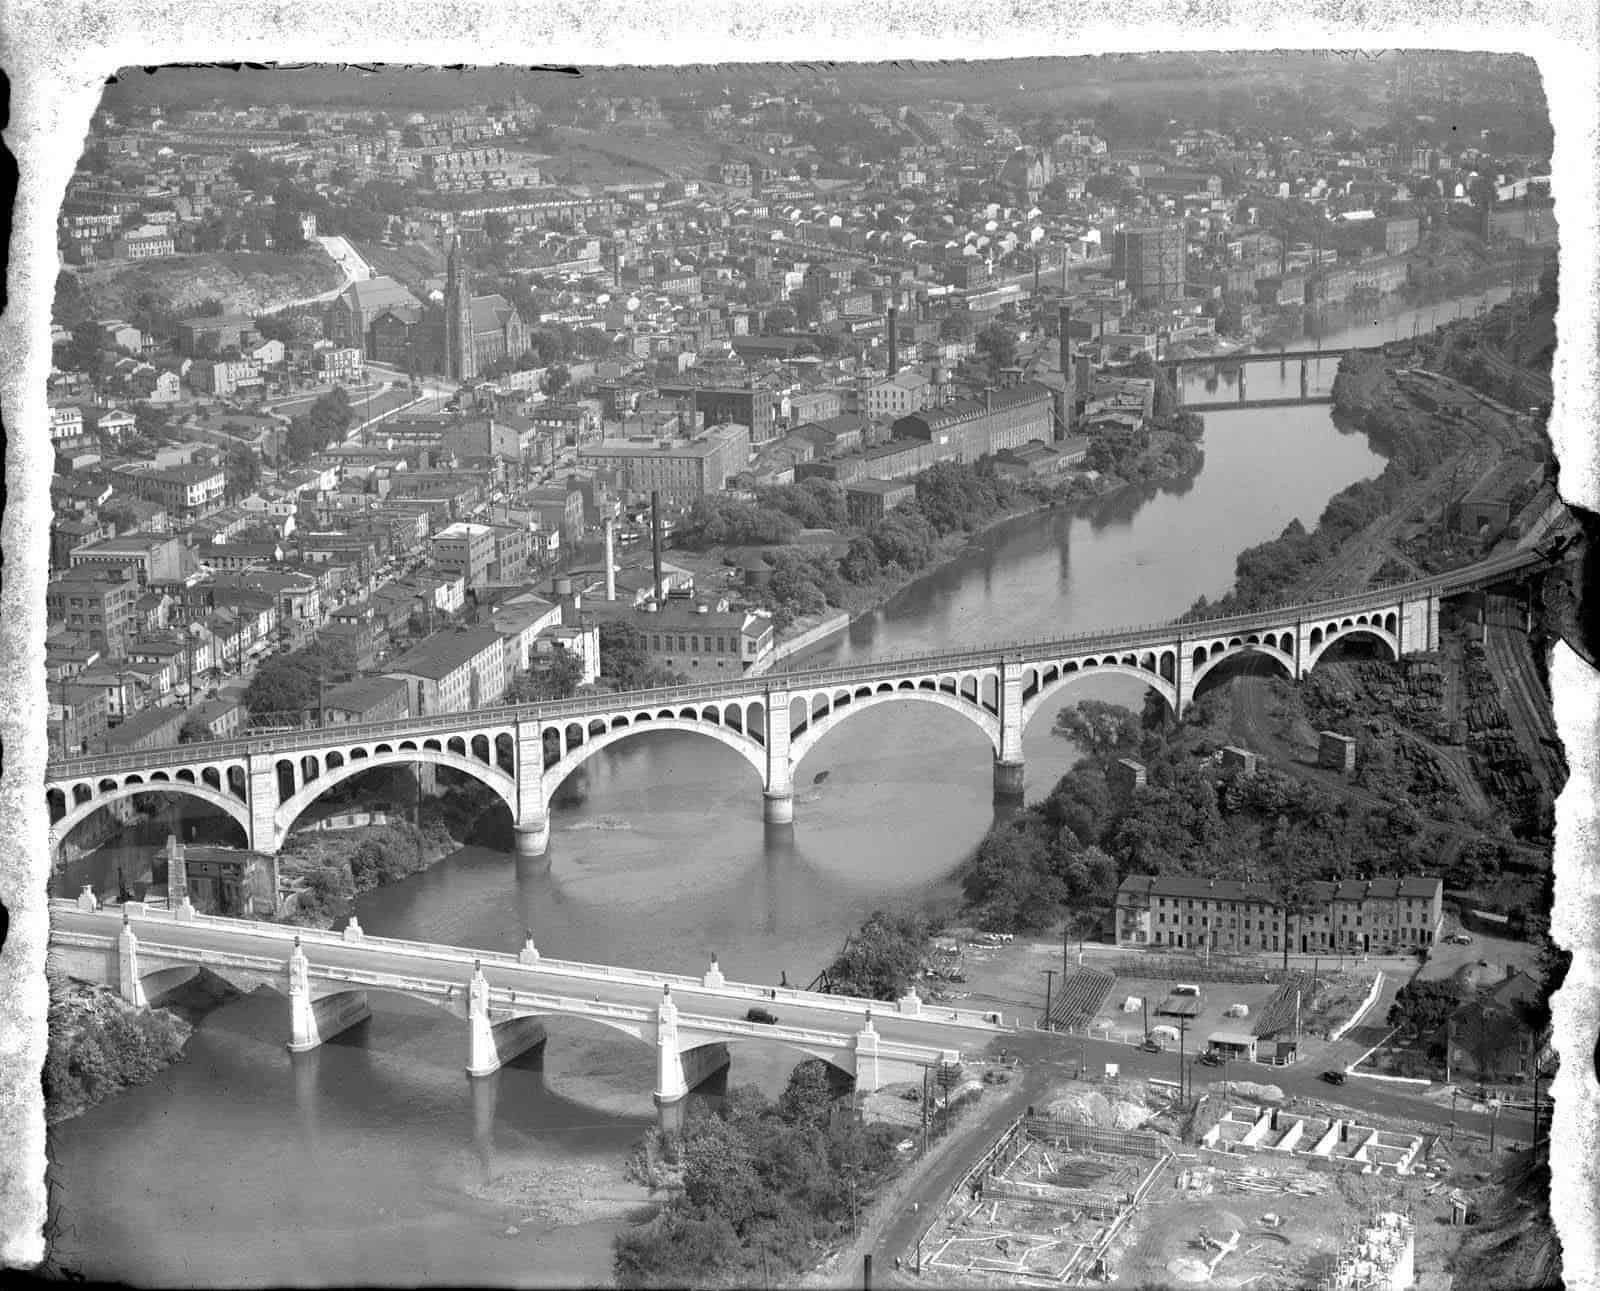 Pennsylvania Railroad, Manayunk Bridge, Spanning Schuylkill River & Green Lane, Manayunk, Philadelphia. ca. 1928 (P.8990.8844)